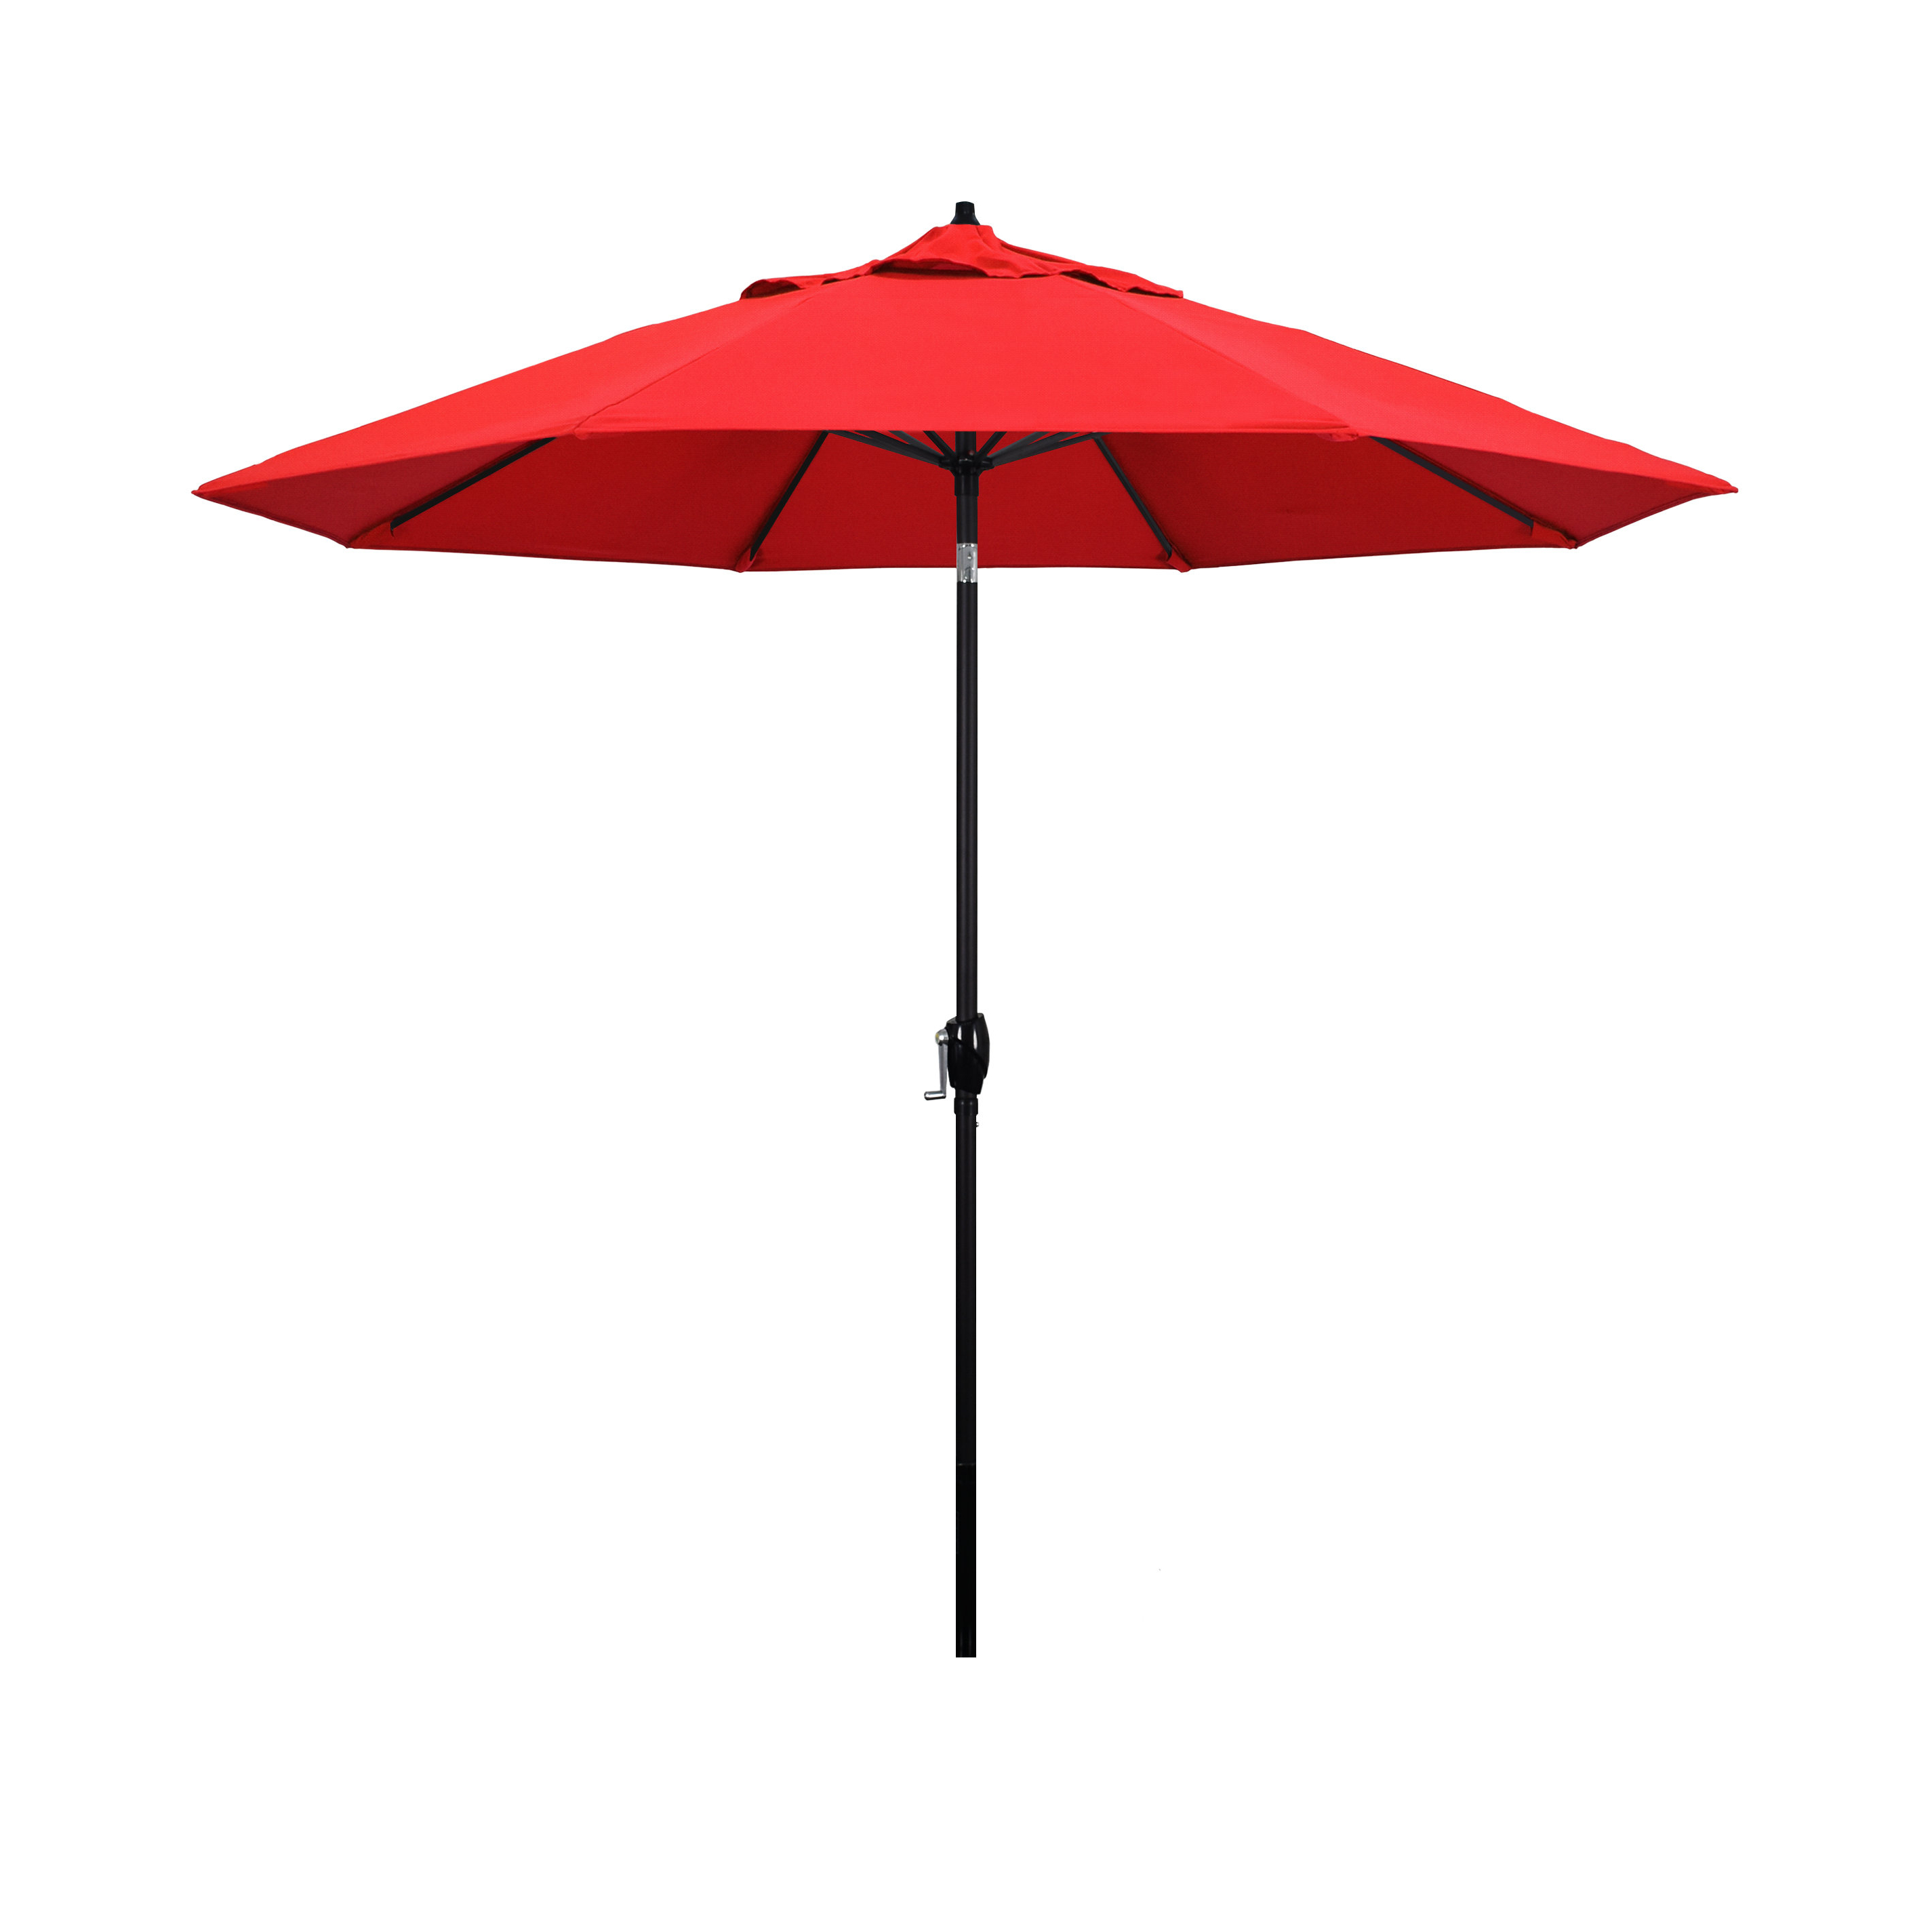 9' Market Sunbrella Umbrella With Regard To Preferred Caravelle Square Market Sunbrella Umbrellas (View 12 of 20)